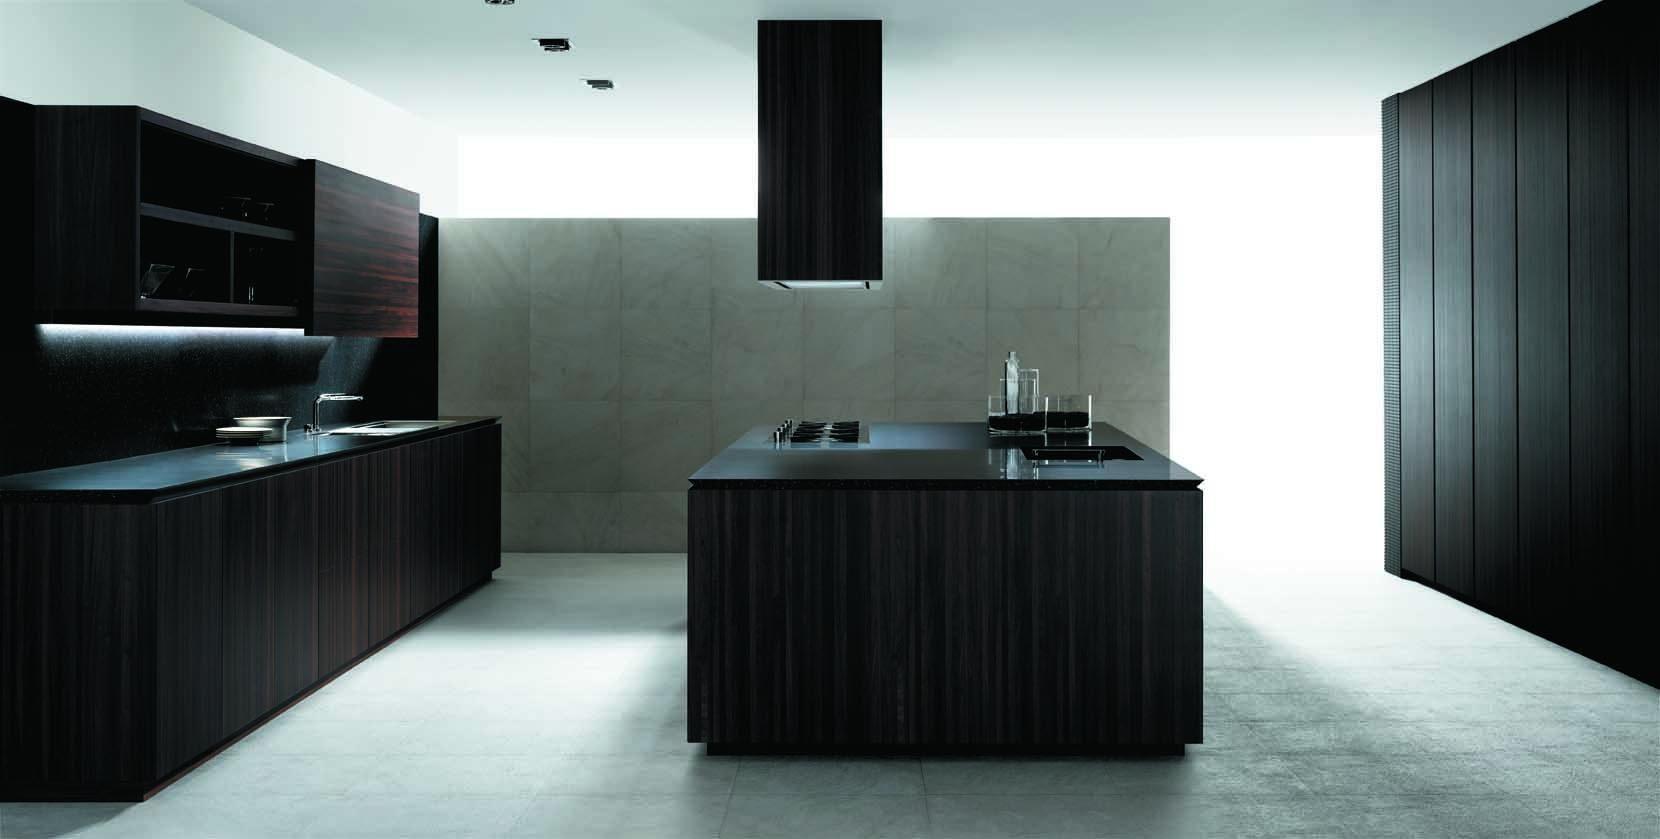 Ikea küche dunstabzugshaube wunderbar bilder kochinsel ikea